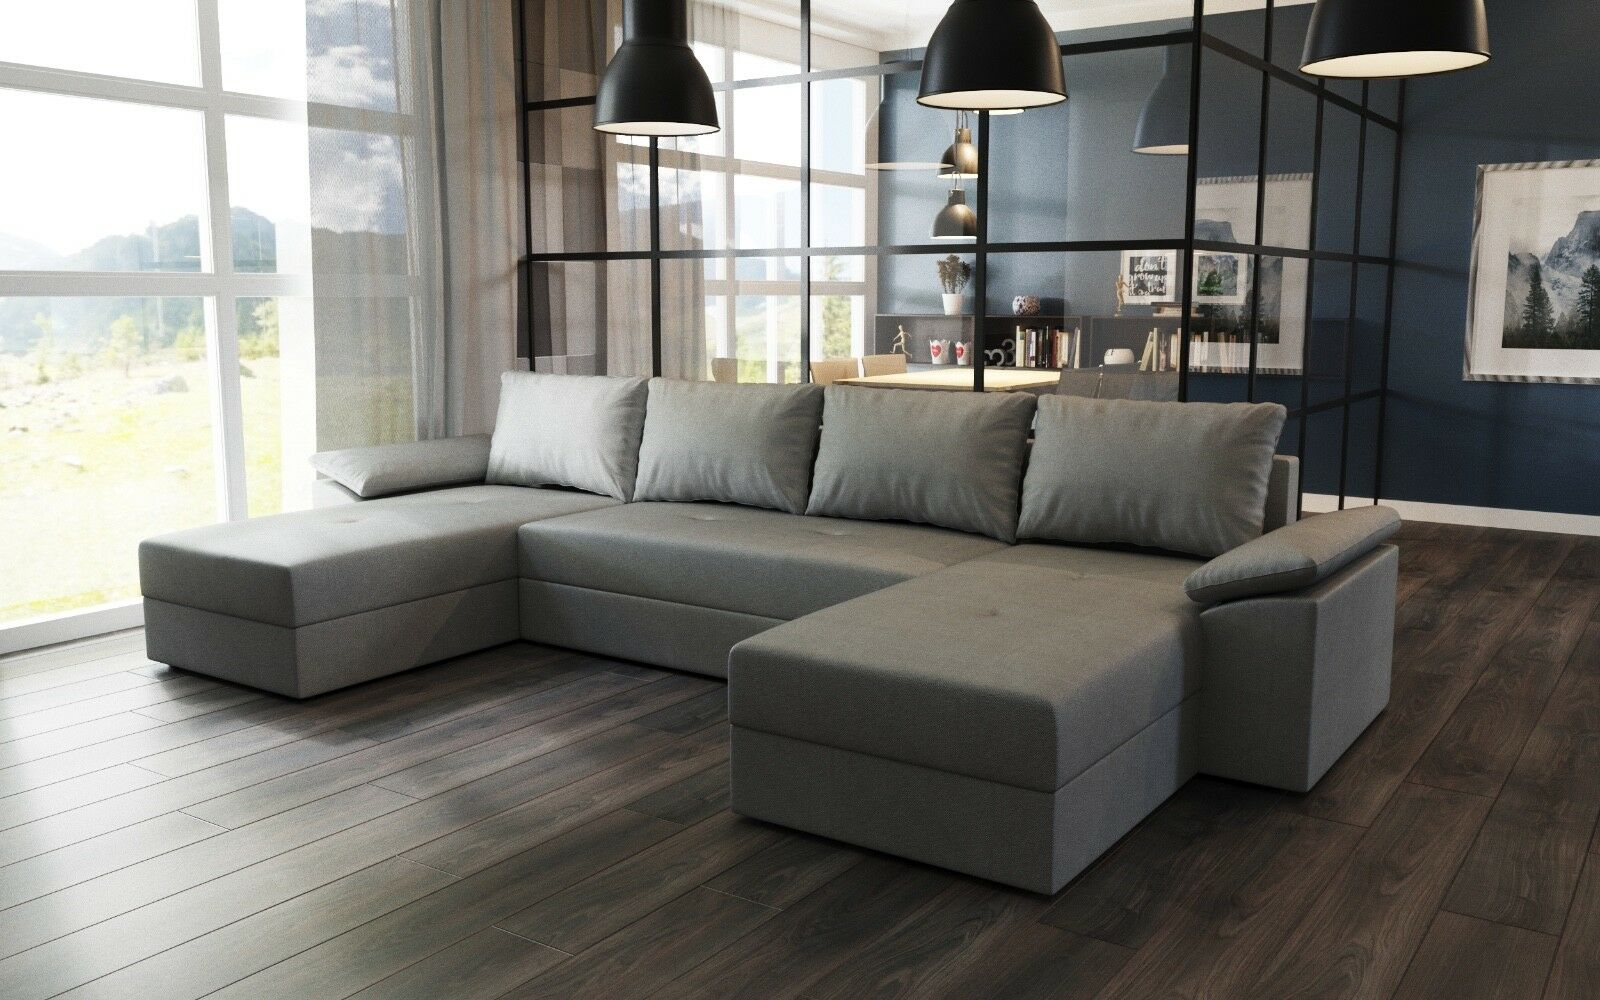 Couchgarnitur Dallas U Ecksofa Eck Couch Sofagarnitur Sofa